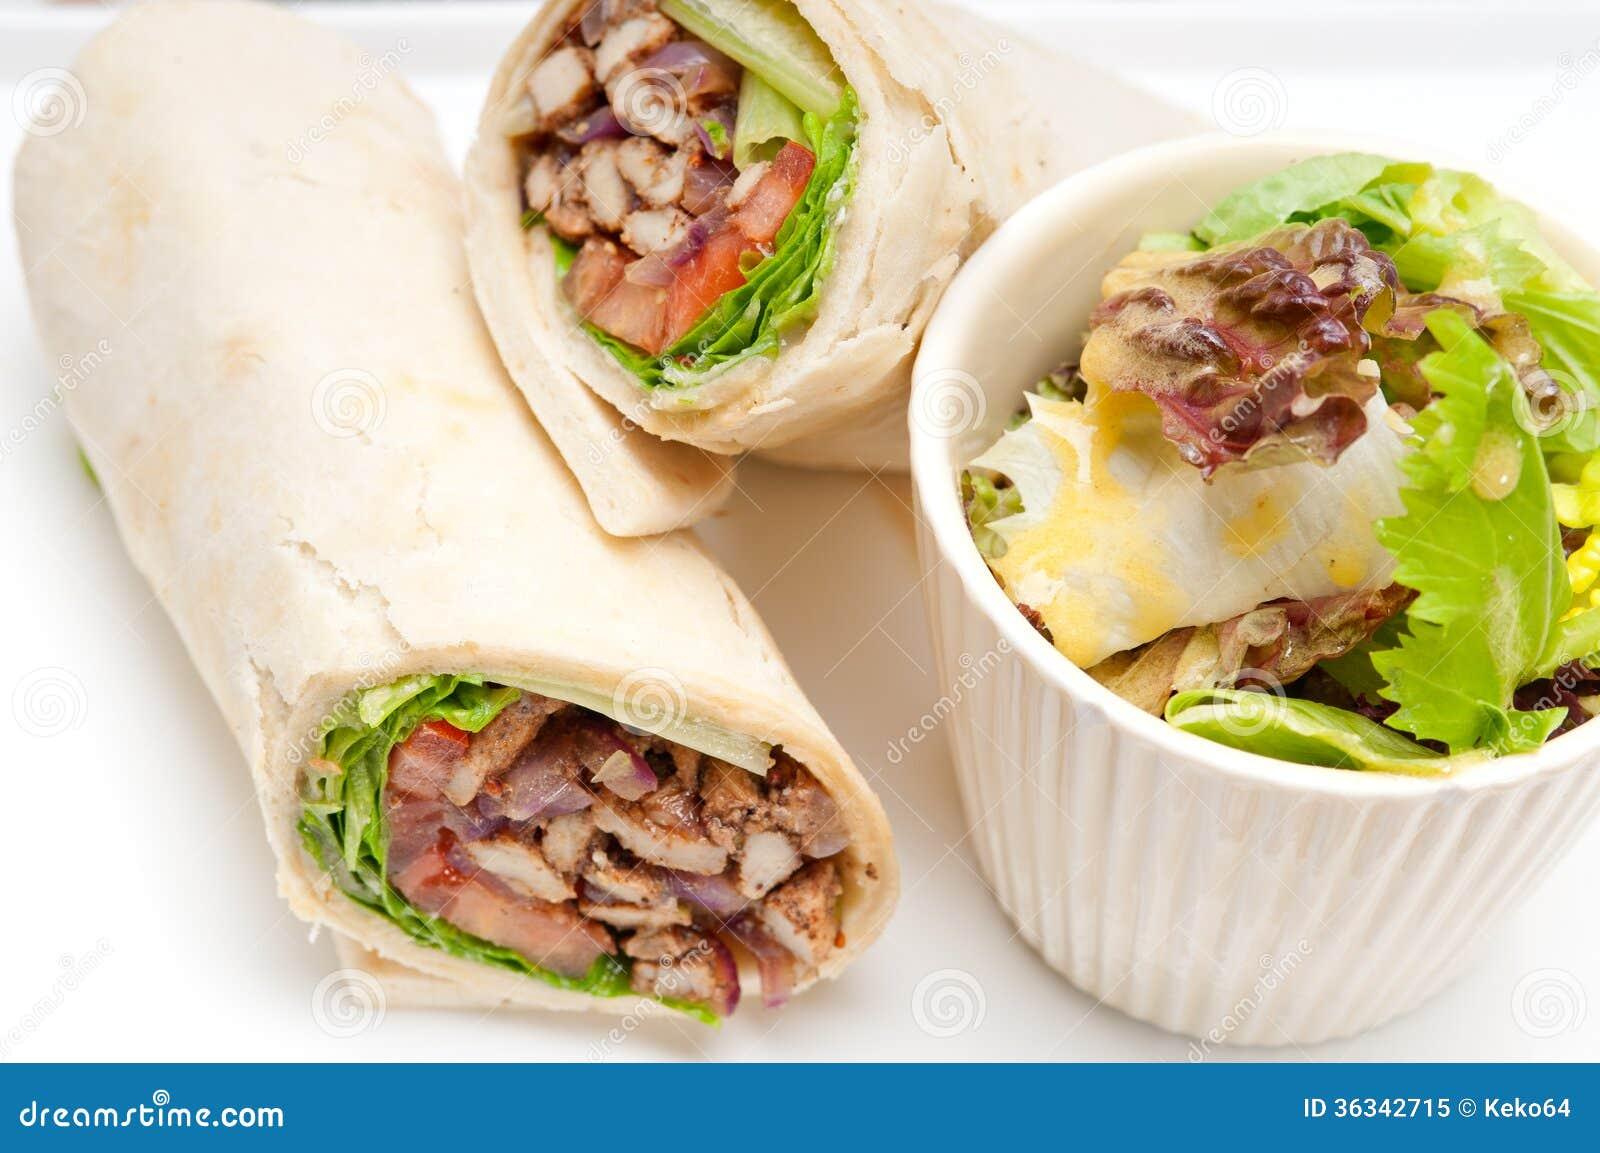 Chicken shawarma roll - photo#24